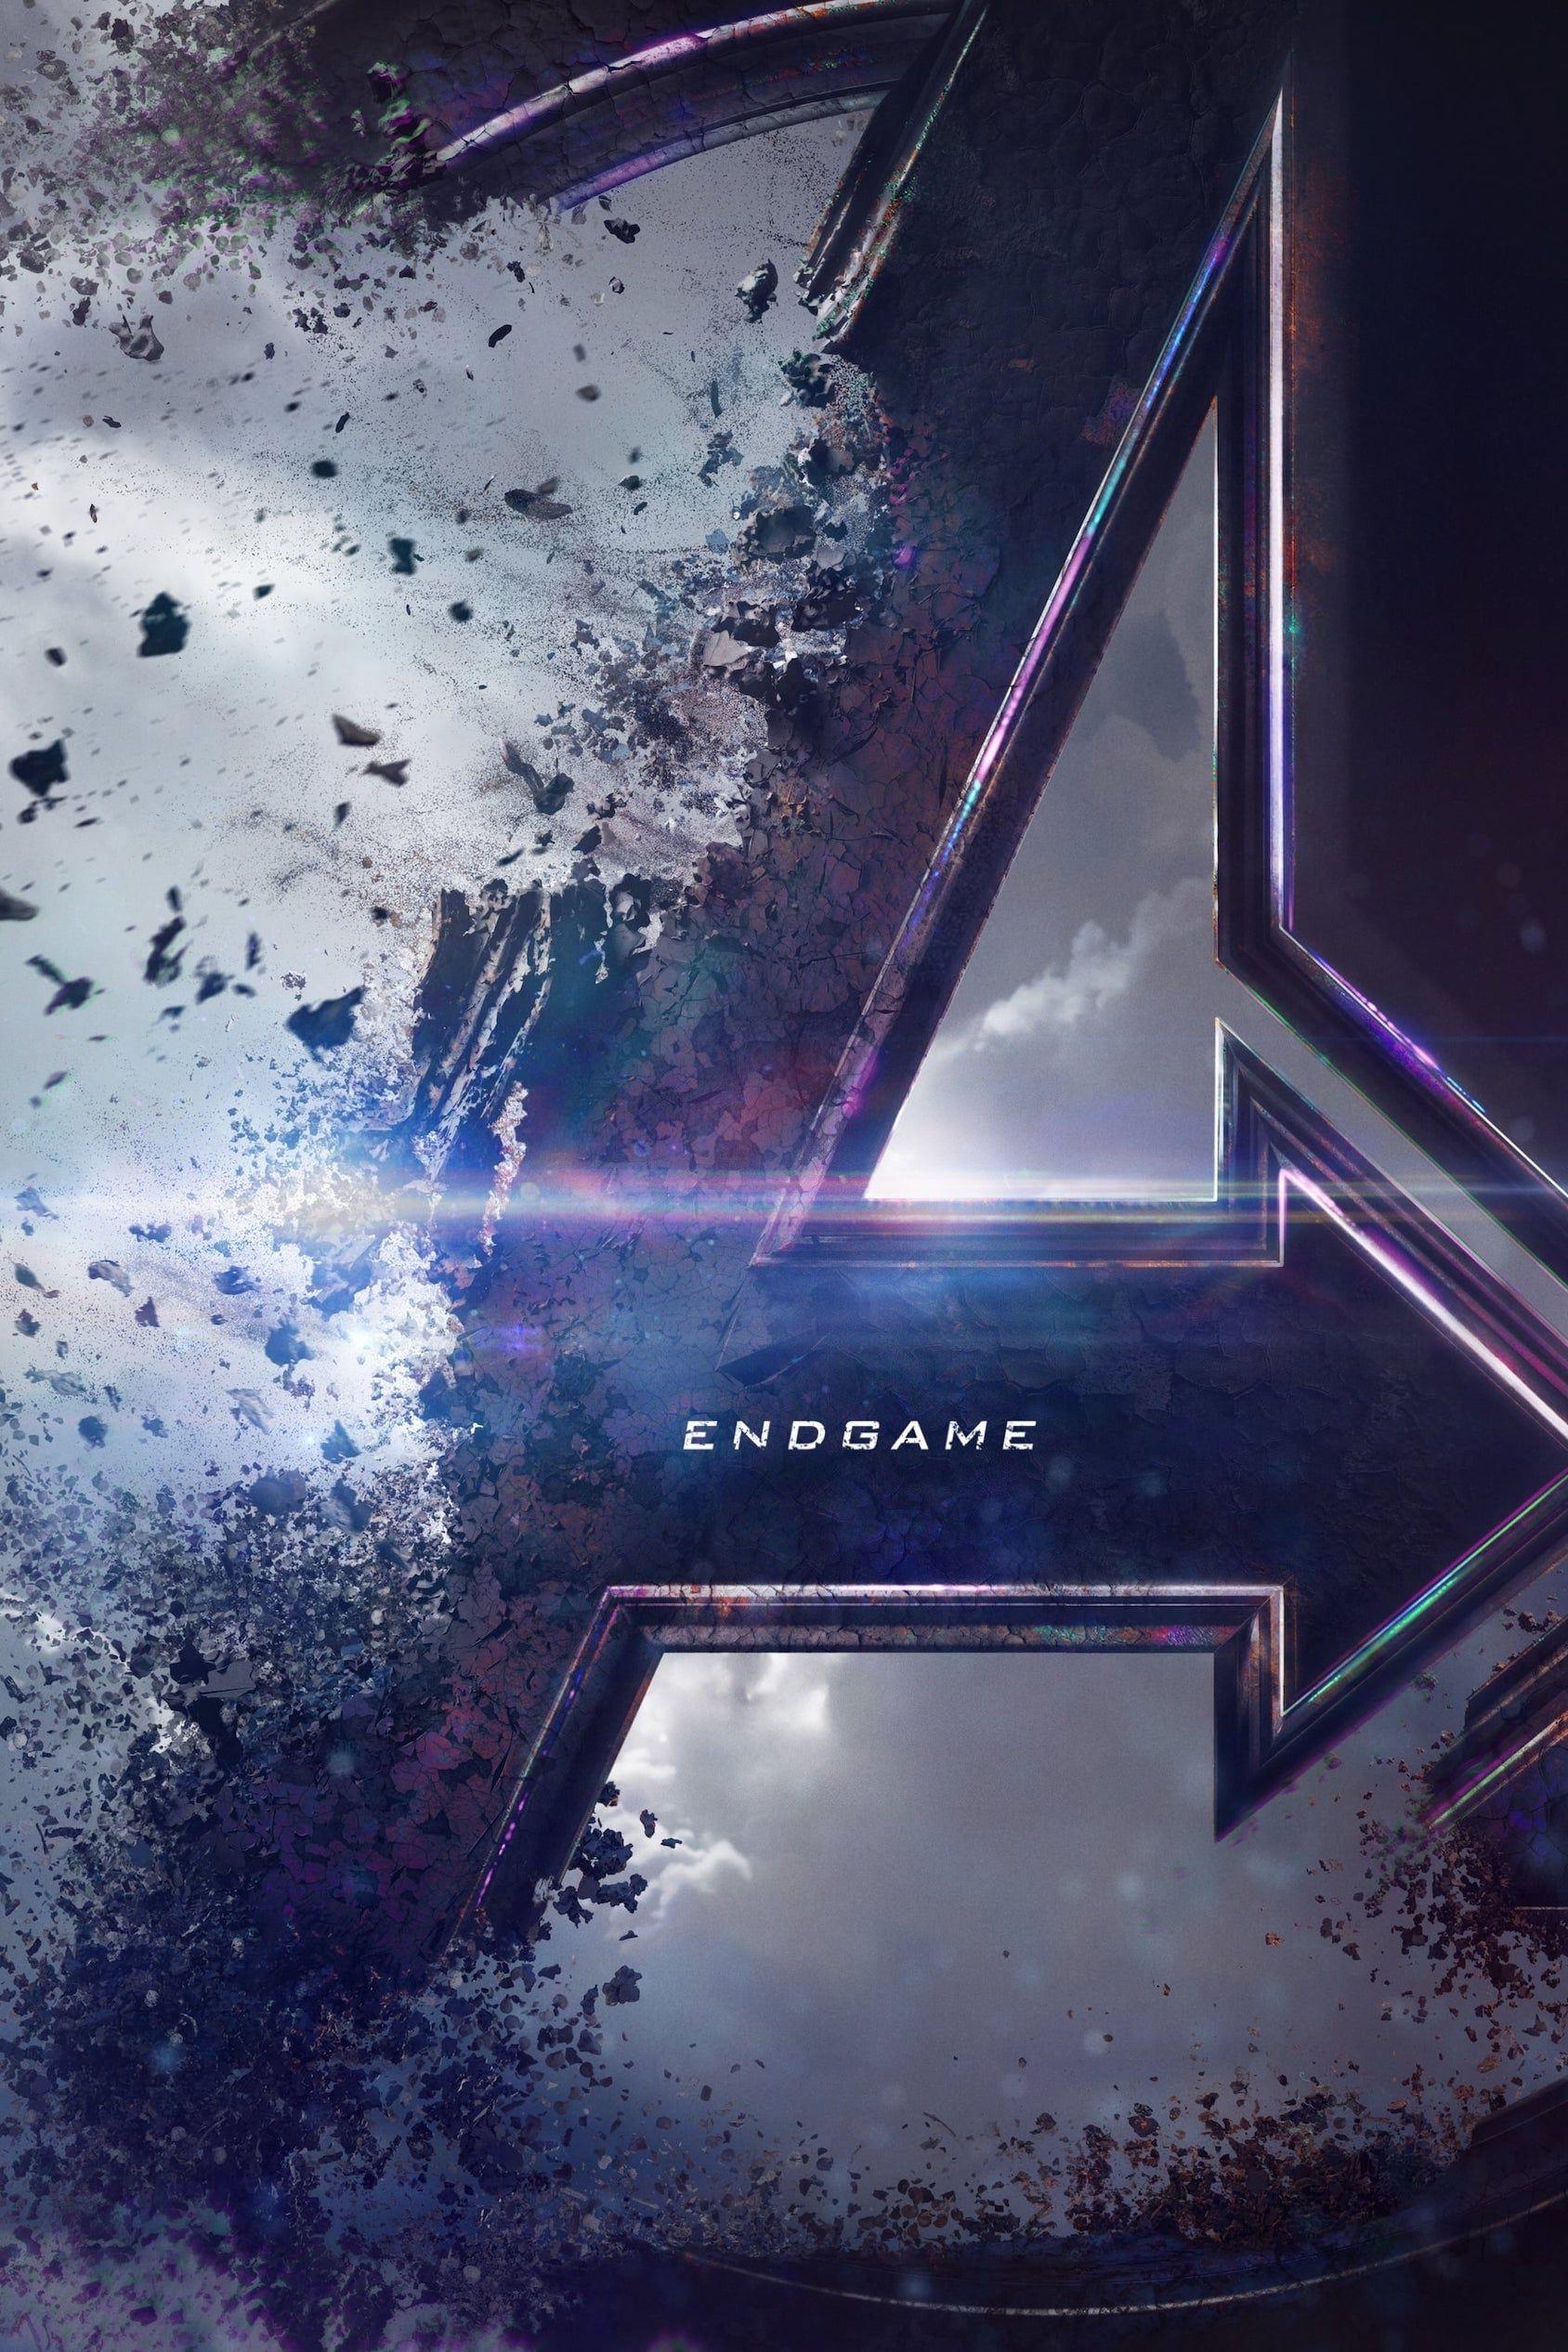 Ver Hd Avengers Endgame 2019 Pelicula Completa Gratis Online En Espanol Latino Lista De Filmes Da Marvel Vingadores Marvel Avengers